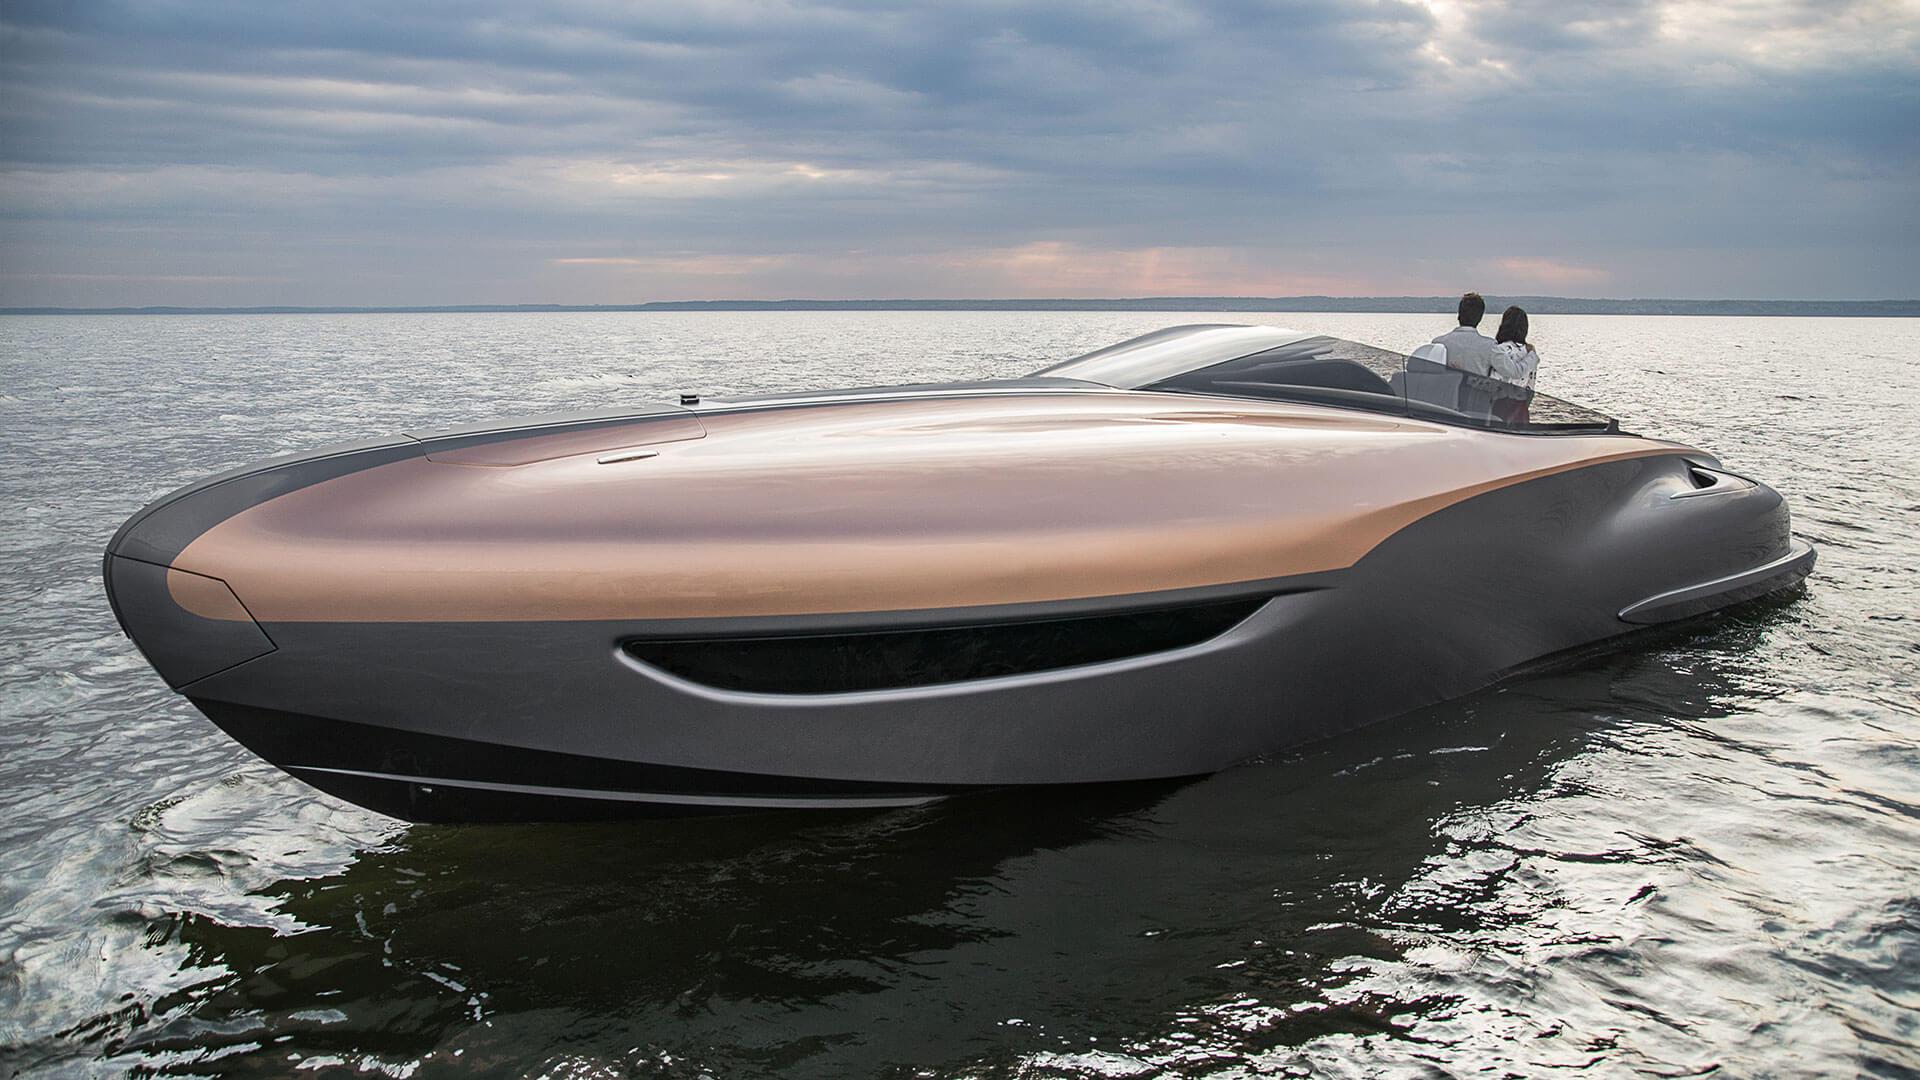 2017 lexus yacht gallery03